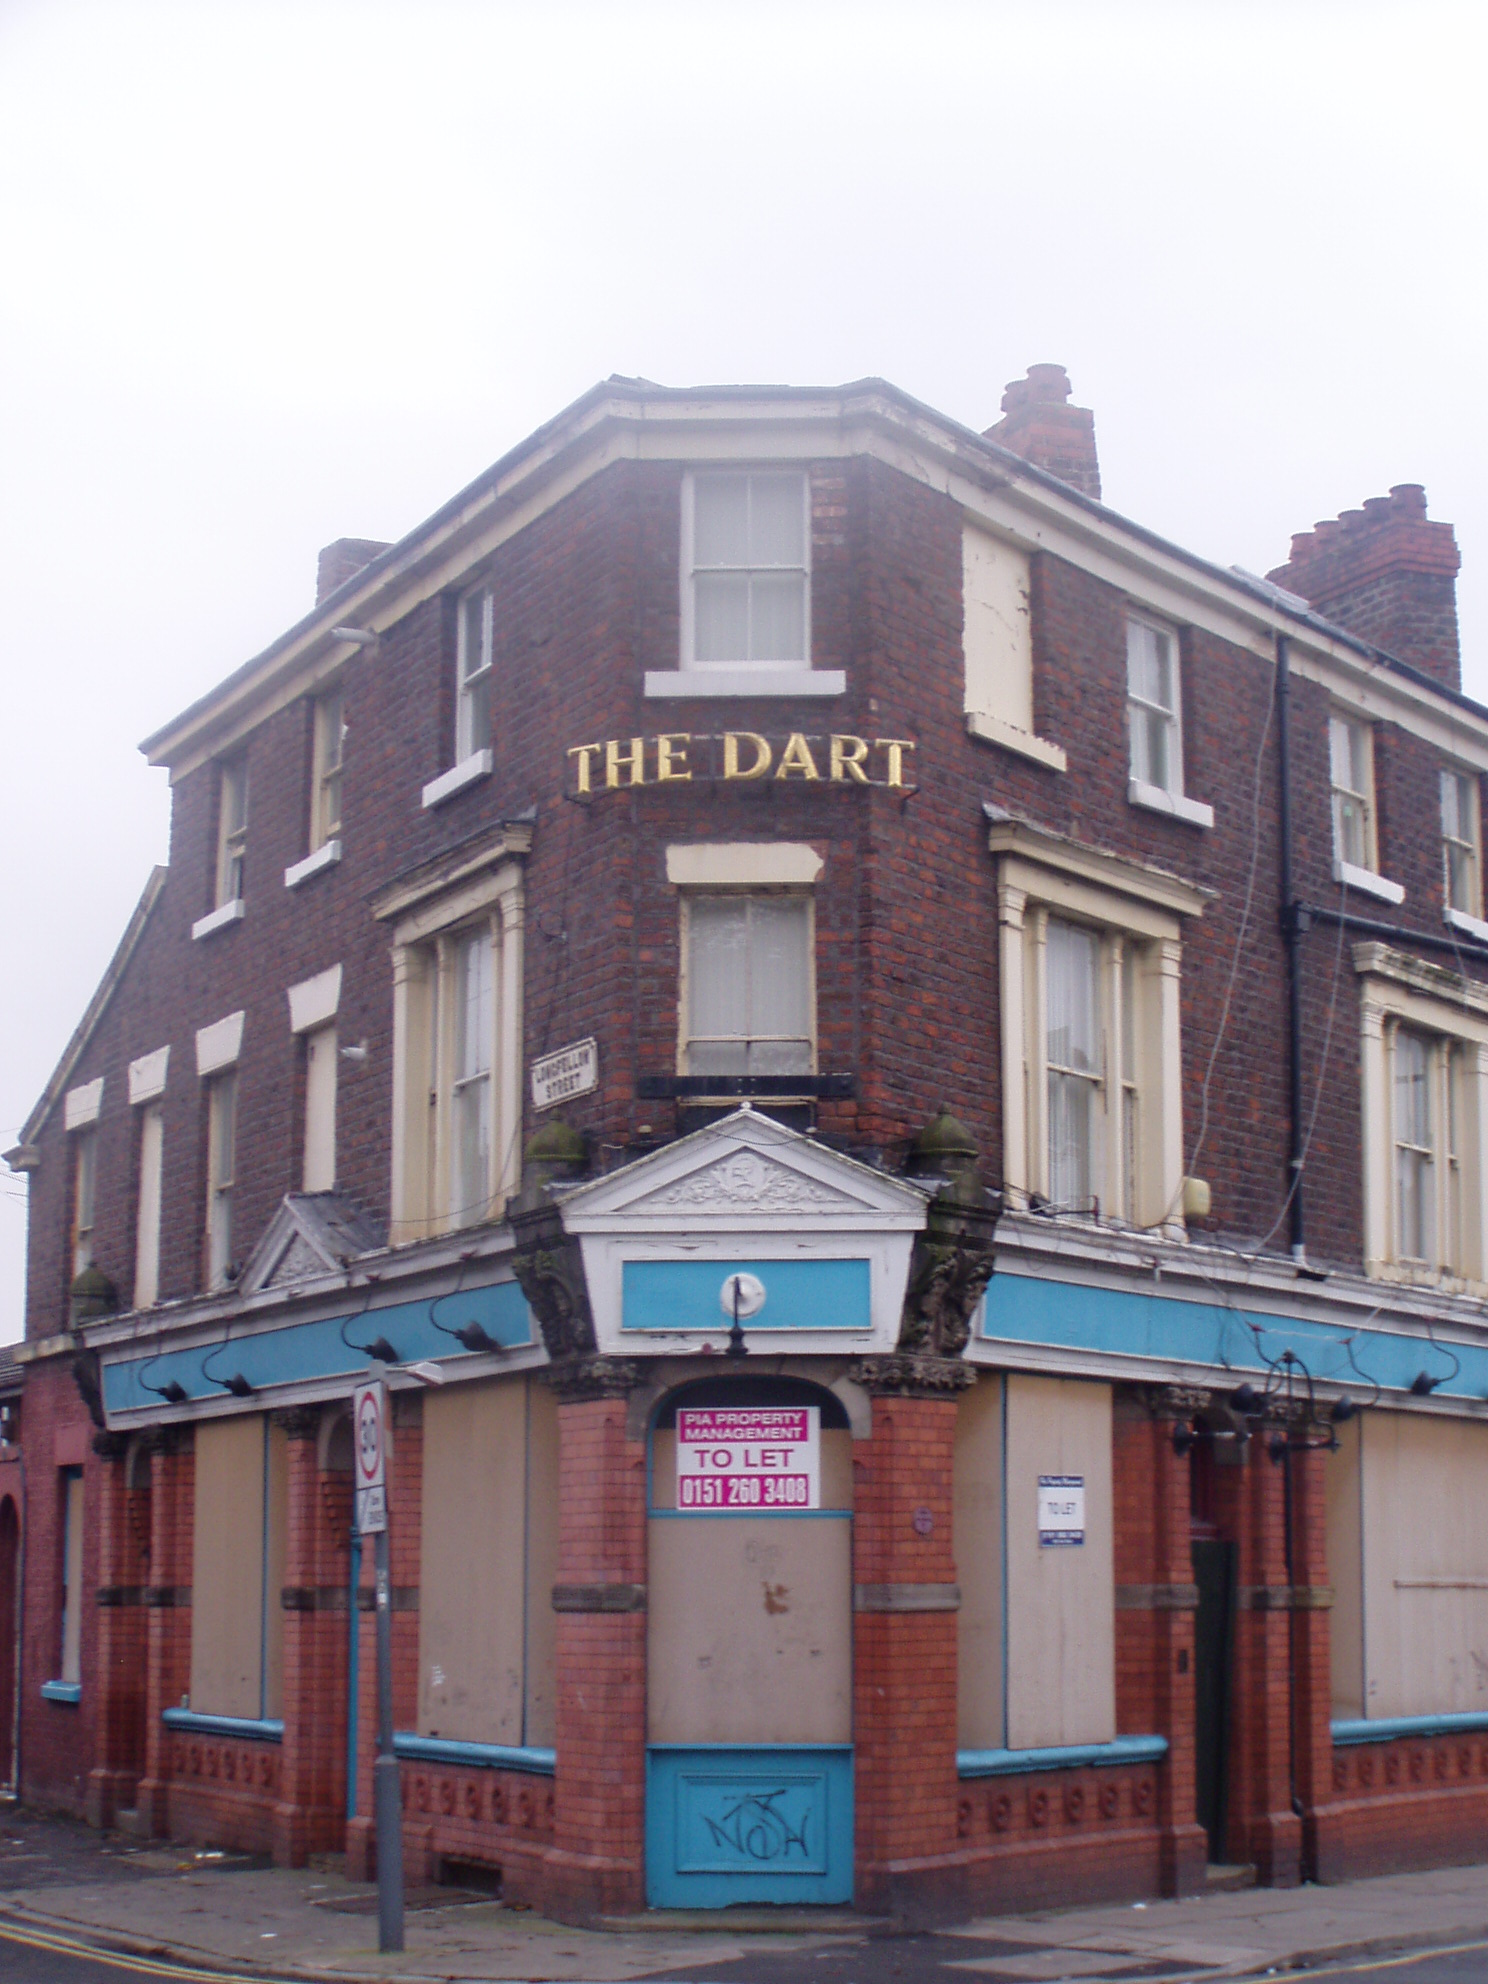 File:The Dart Pub 2 jpg - Wikimedia Commons